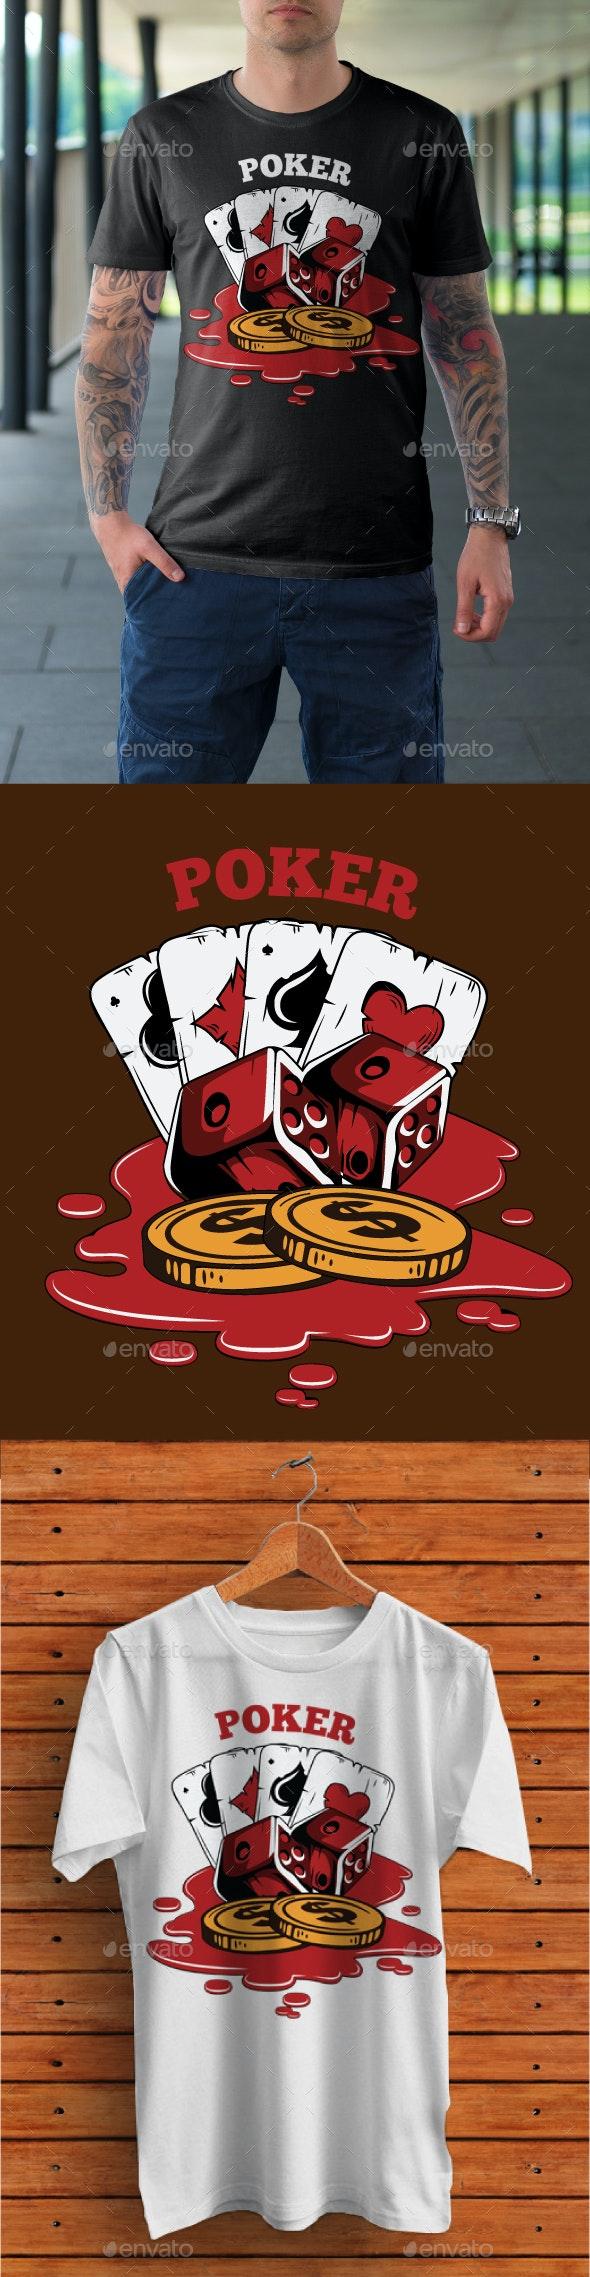 Poker T-Shirt Design - Clean Designs